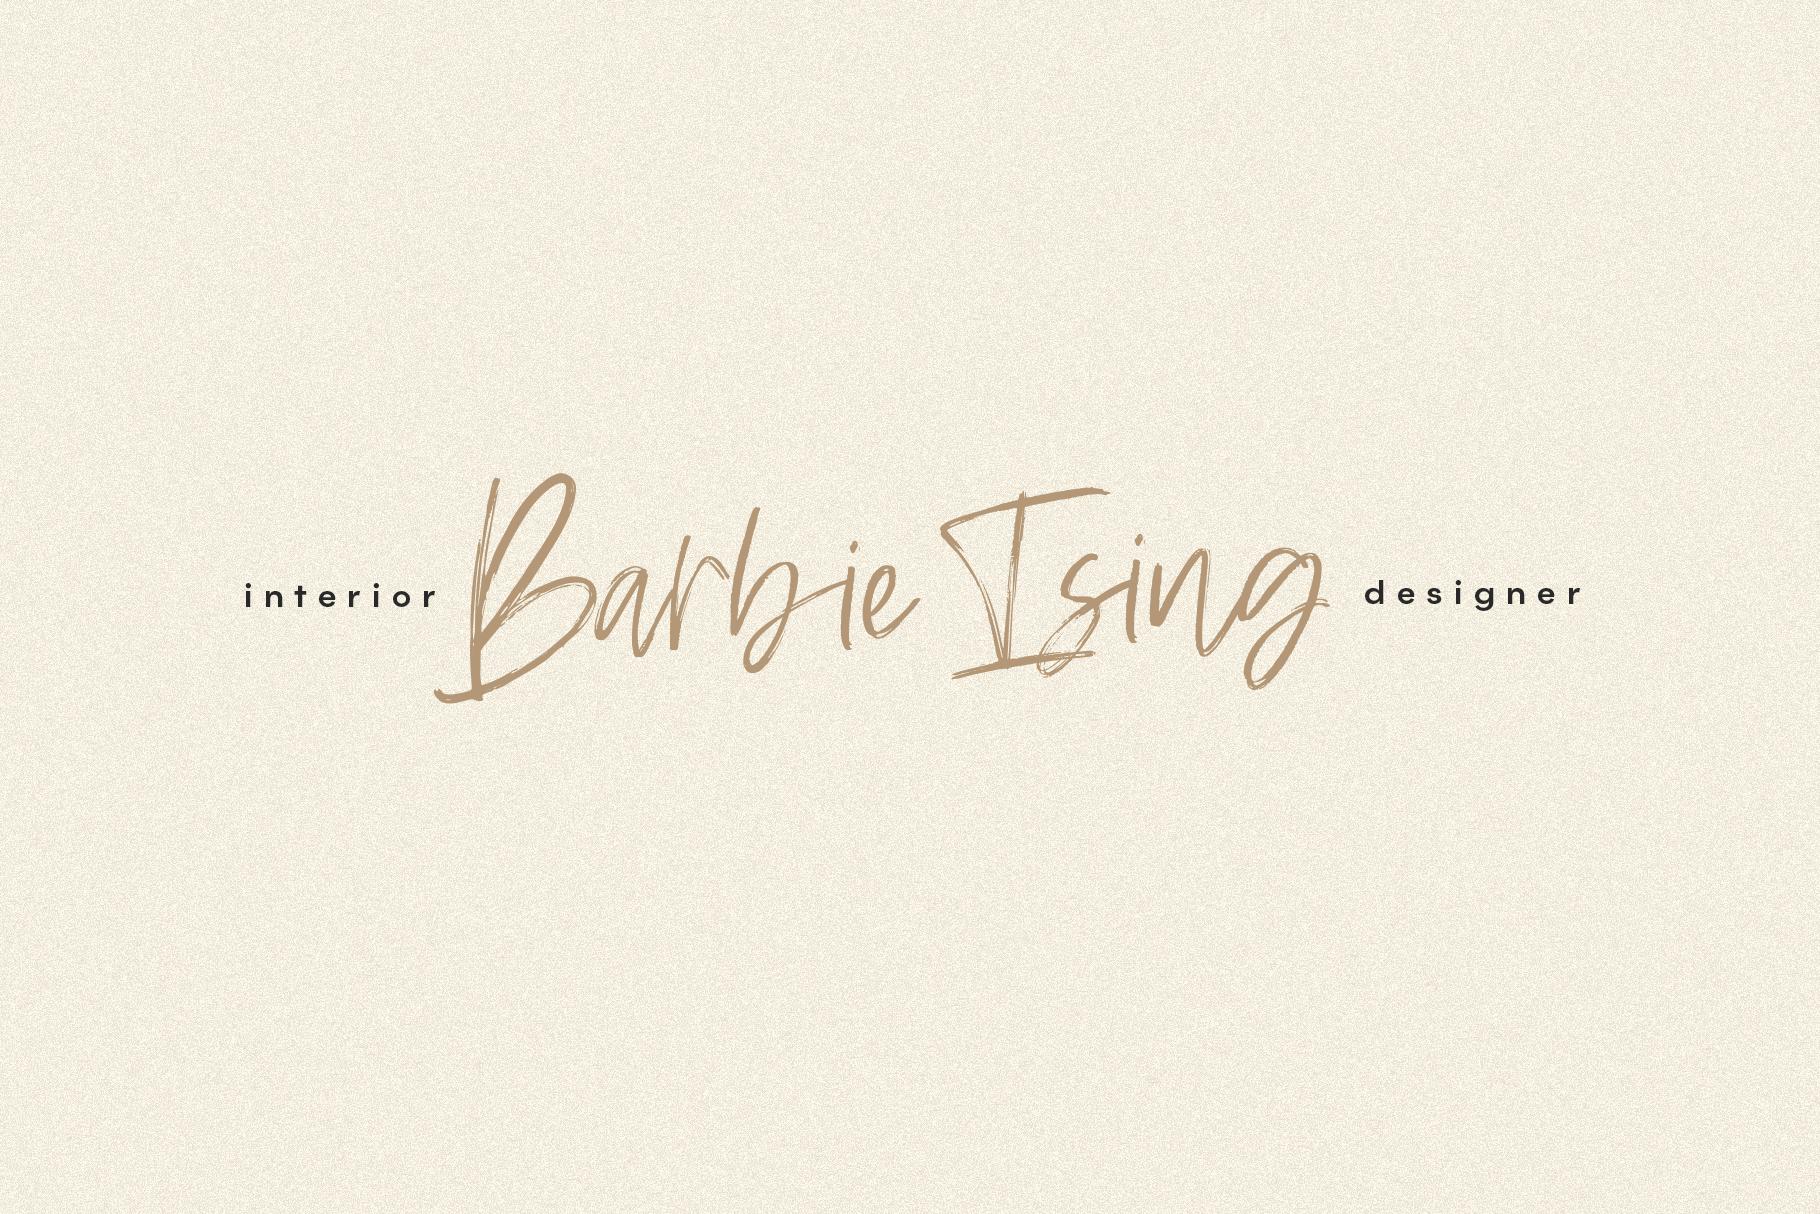 Darling - A Handwritten Brush Script Font example image 7